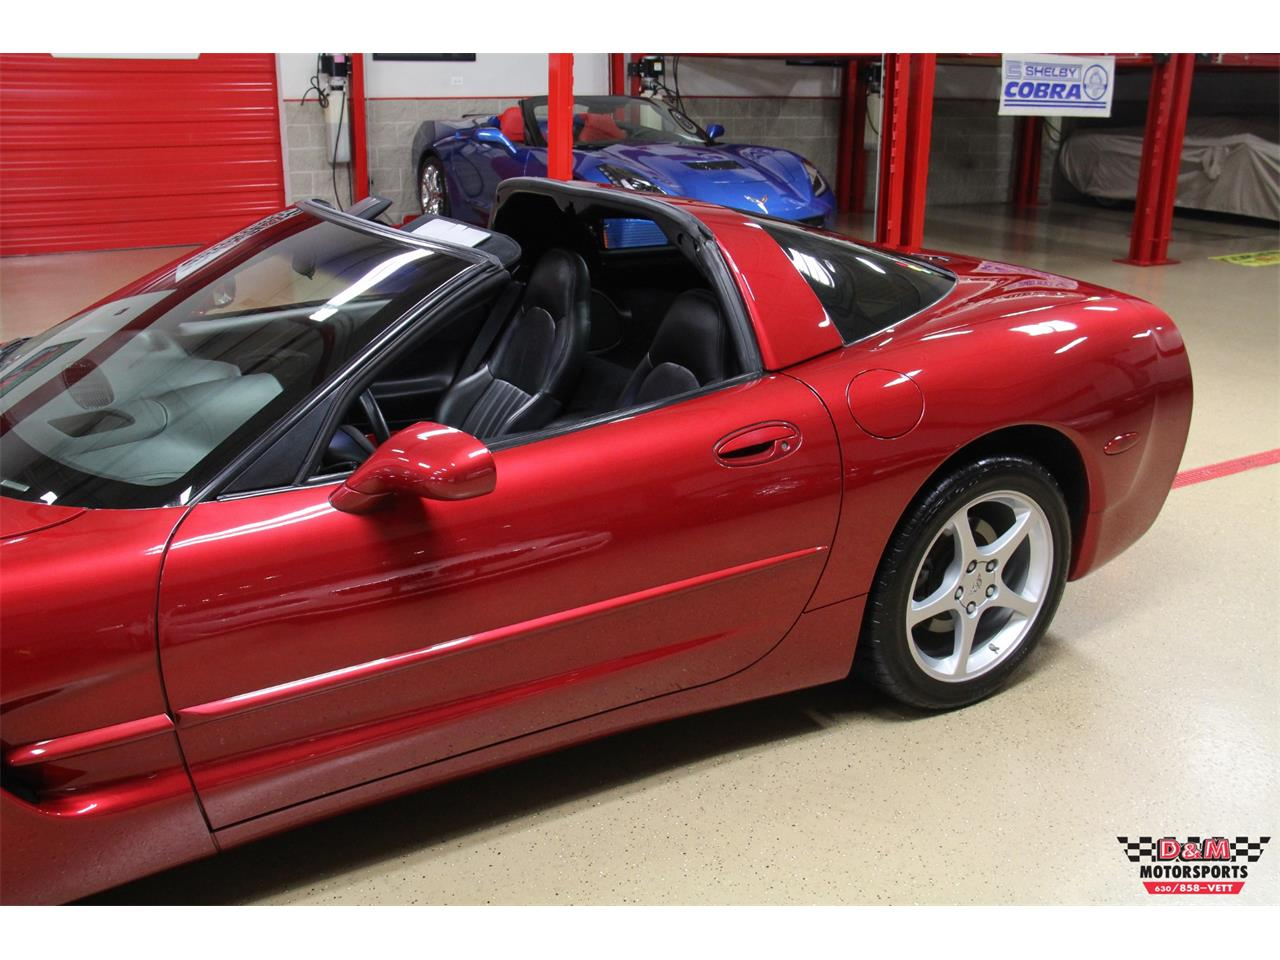 Large Picture of '00 Chevrolet Corvette located in Illinois - $15,995.00 - LVA3